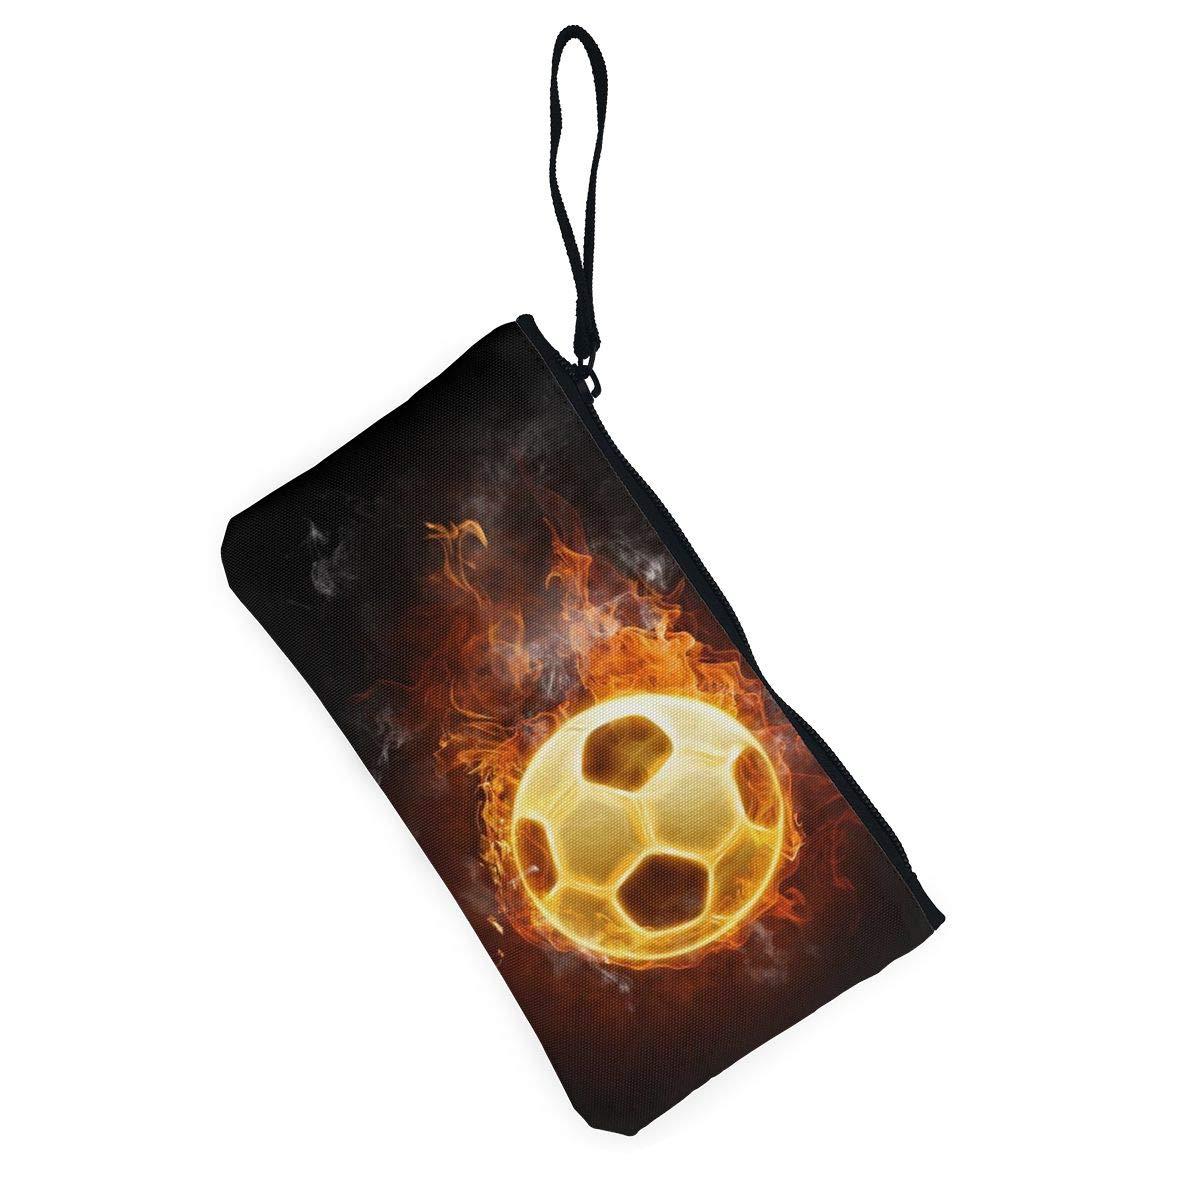 YUANSHAN Fire Soccer Unisex Canvas Coin Purse Change Cash Bag Zipper Small Purse Wallets with Handle